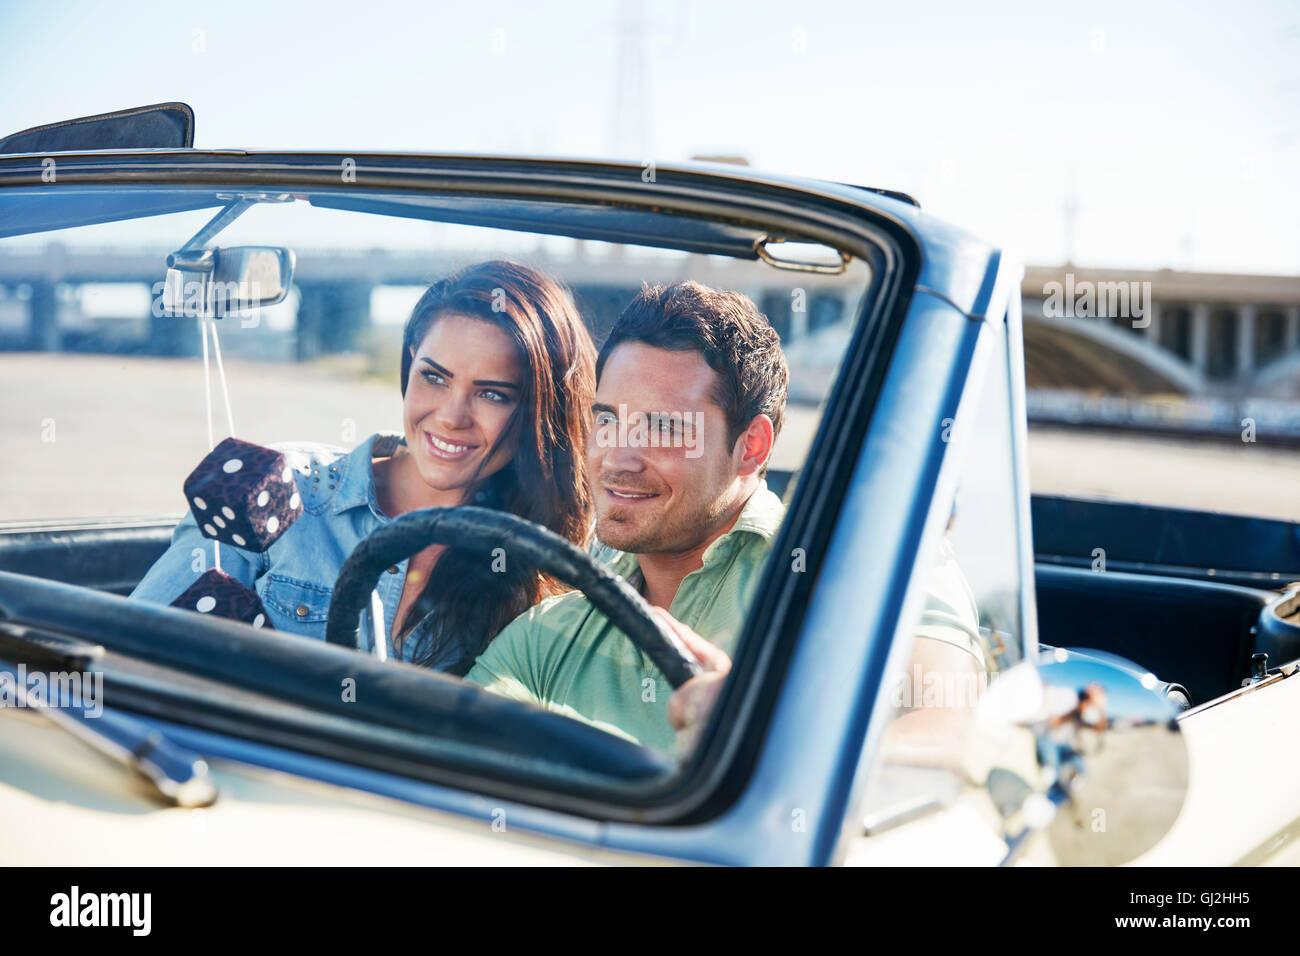 Couple in convertible car, Los Angeles, California, USA - Stock Image